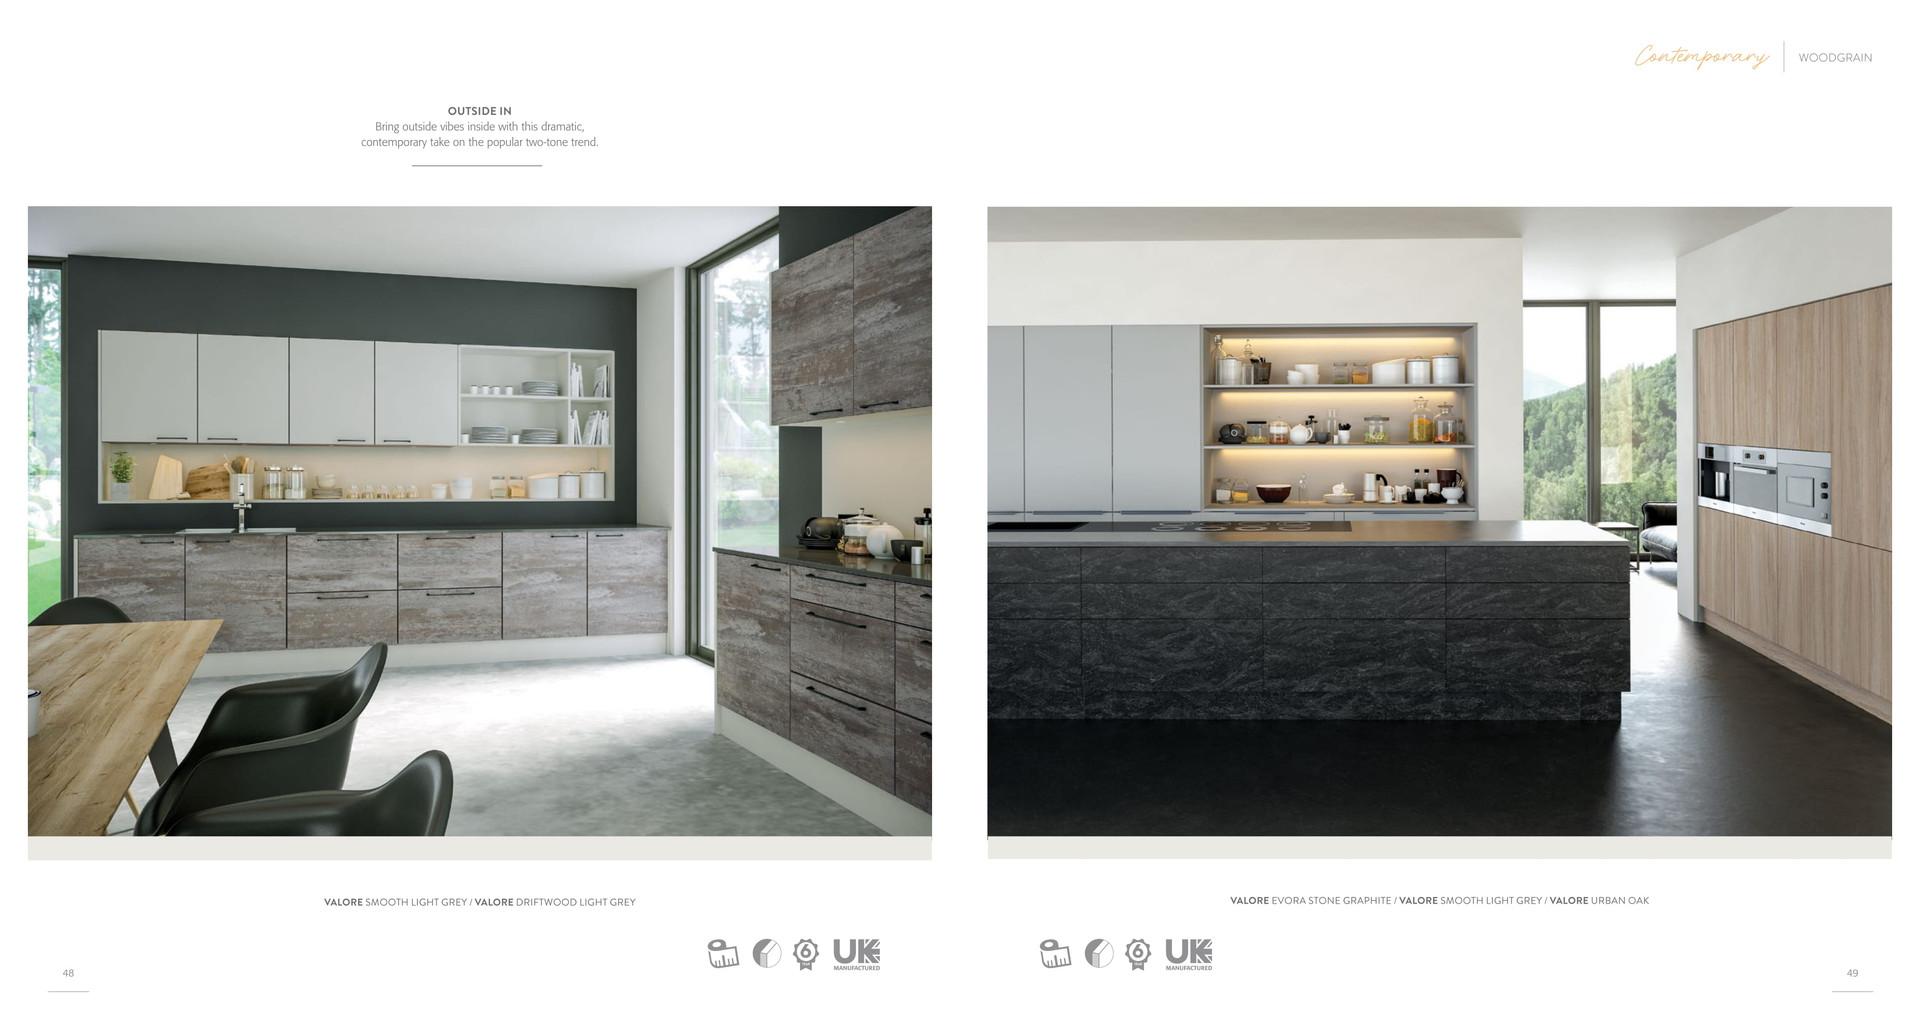 blossom-avenue-kitchen-brochure-2020-25.